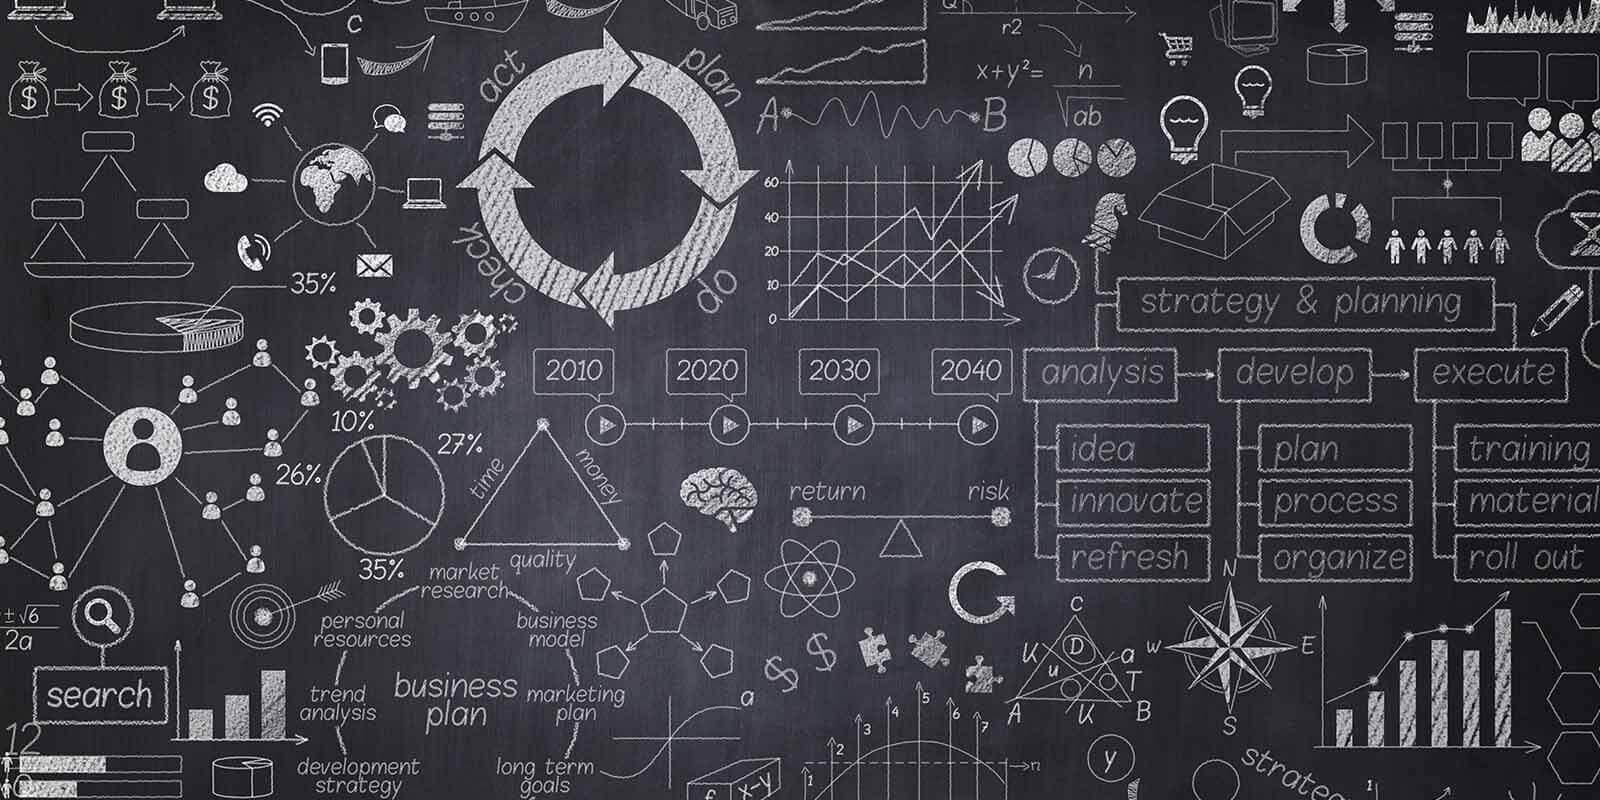 Equilar Long Term Incentive Design Changes Reflect Investor Concerns